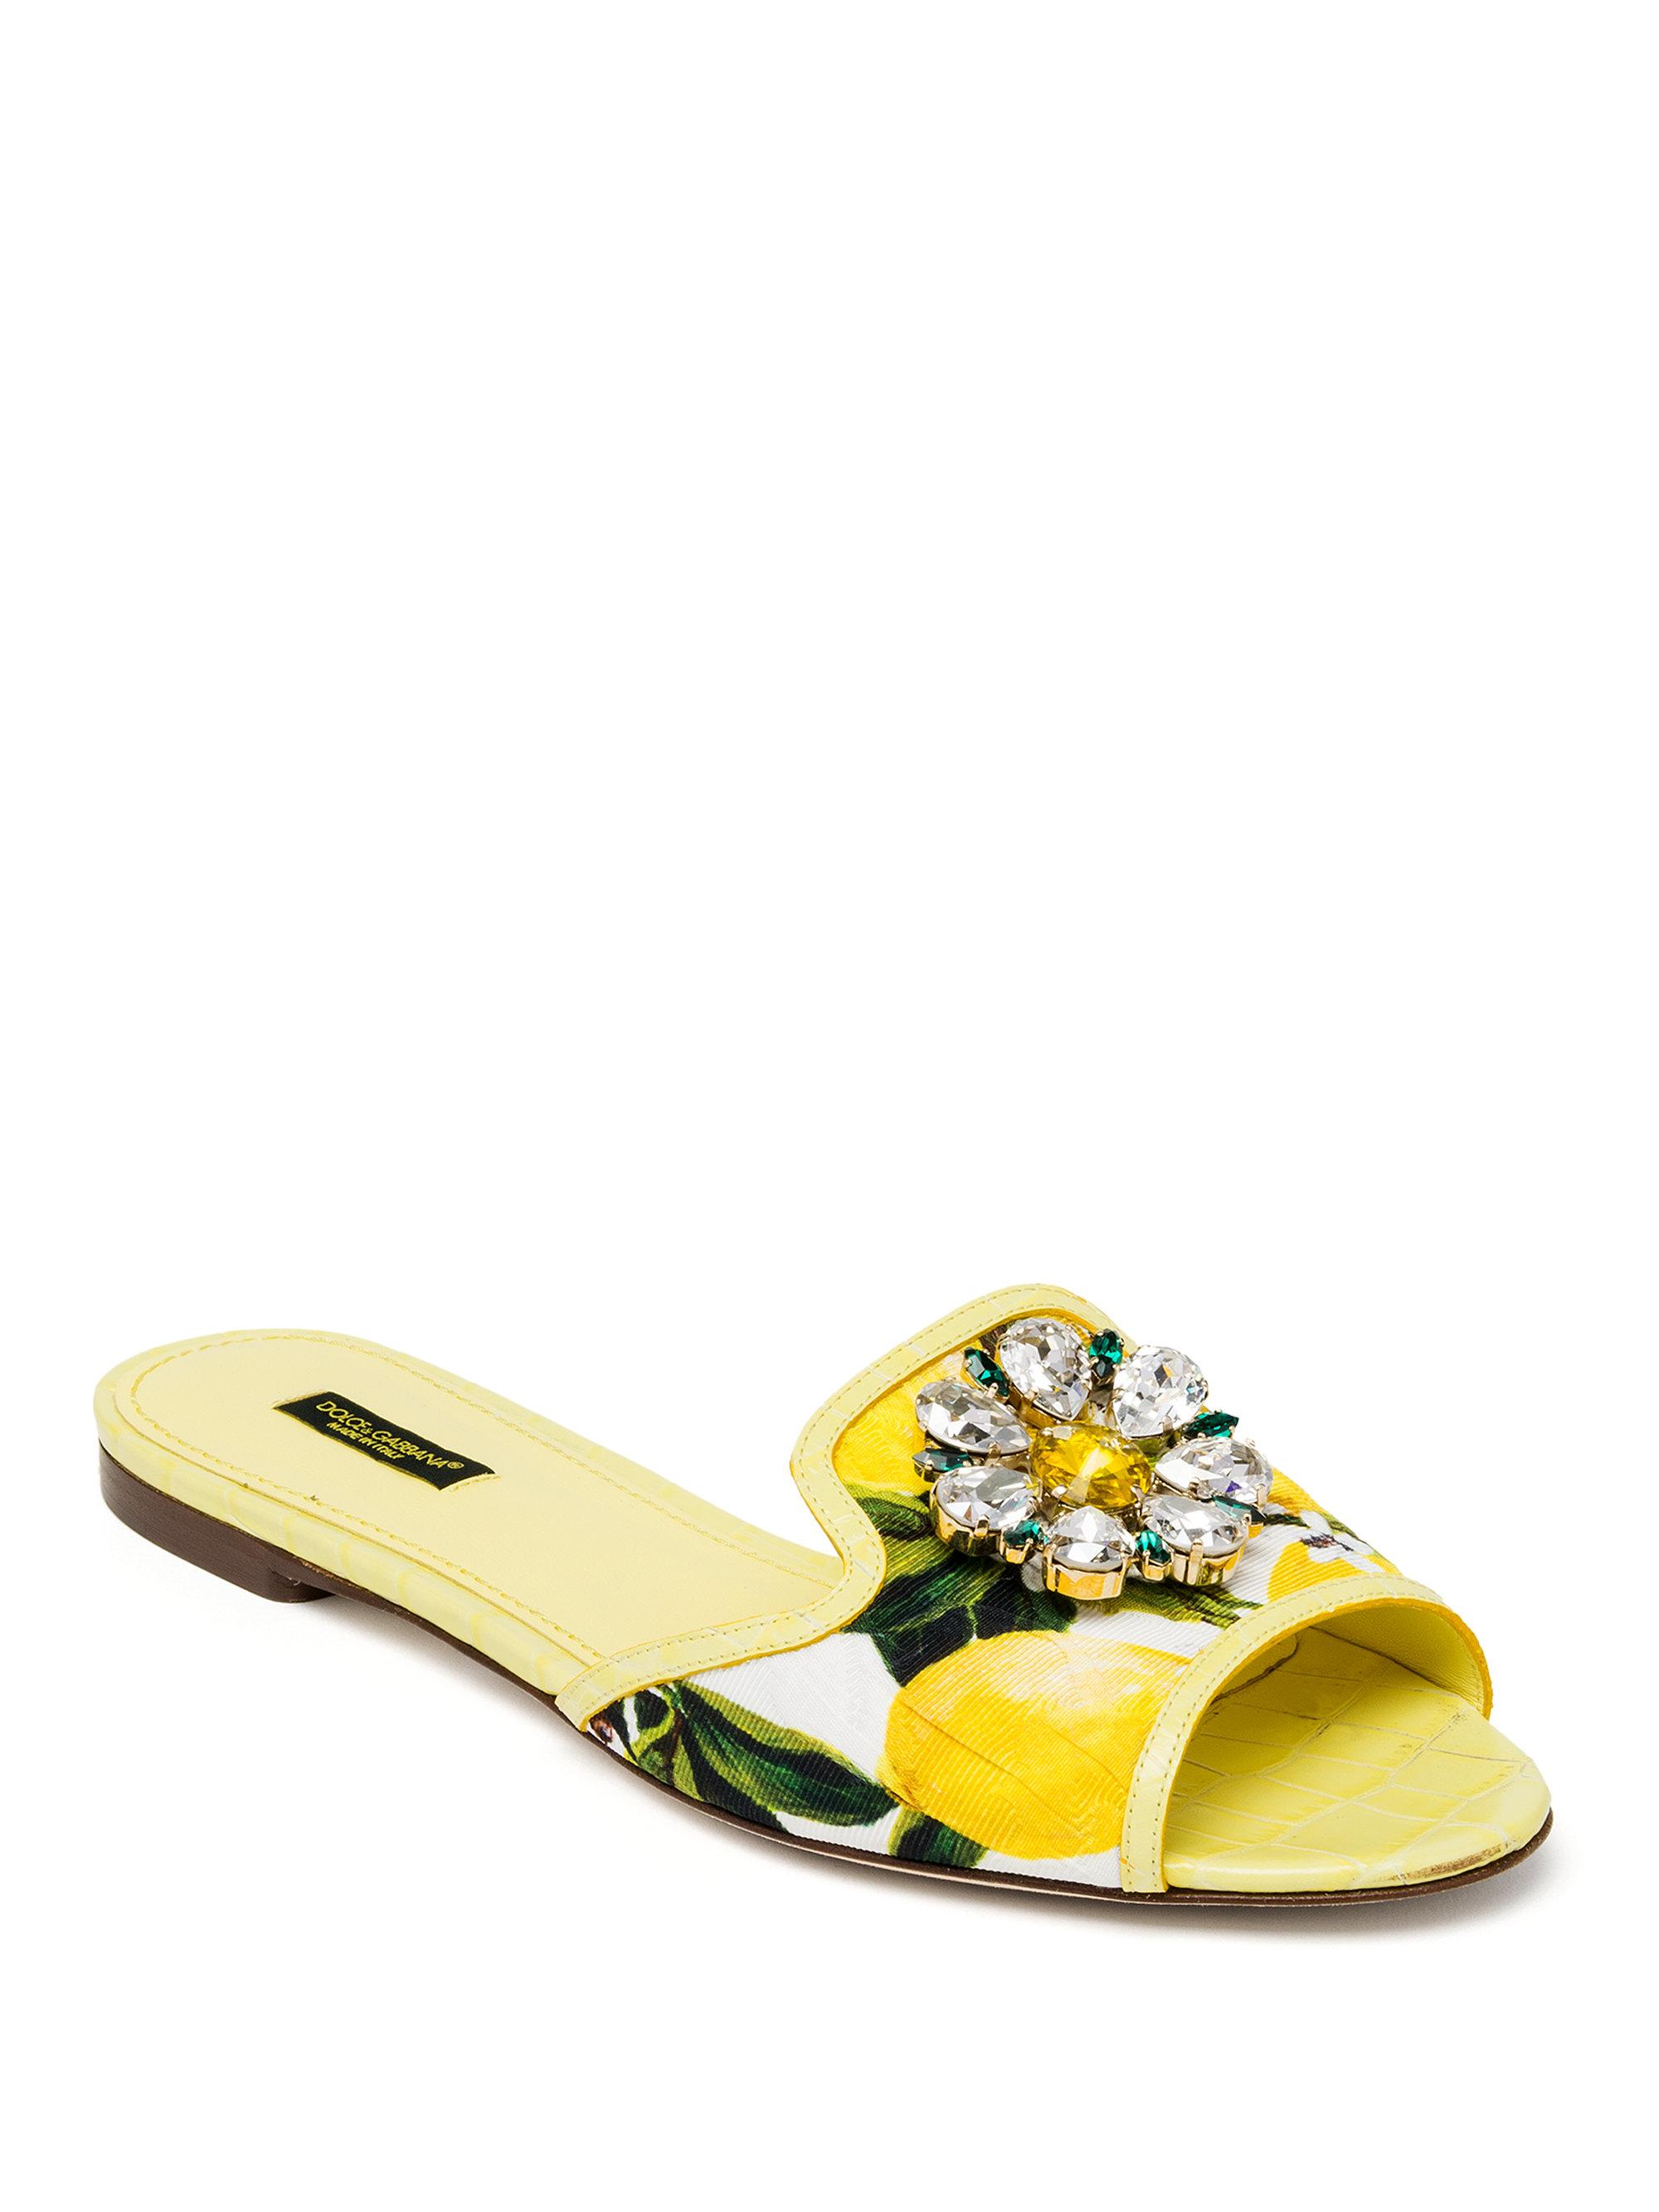 aa3b9a5a2 Dolce & Gabbana Jeweled Lemon Slide Sandals in Yellow - Lyst